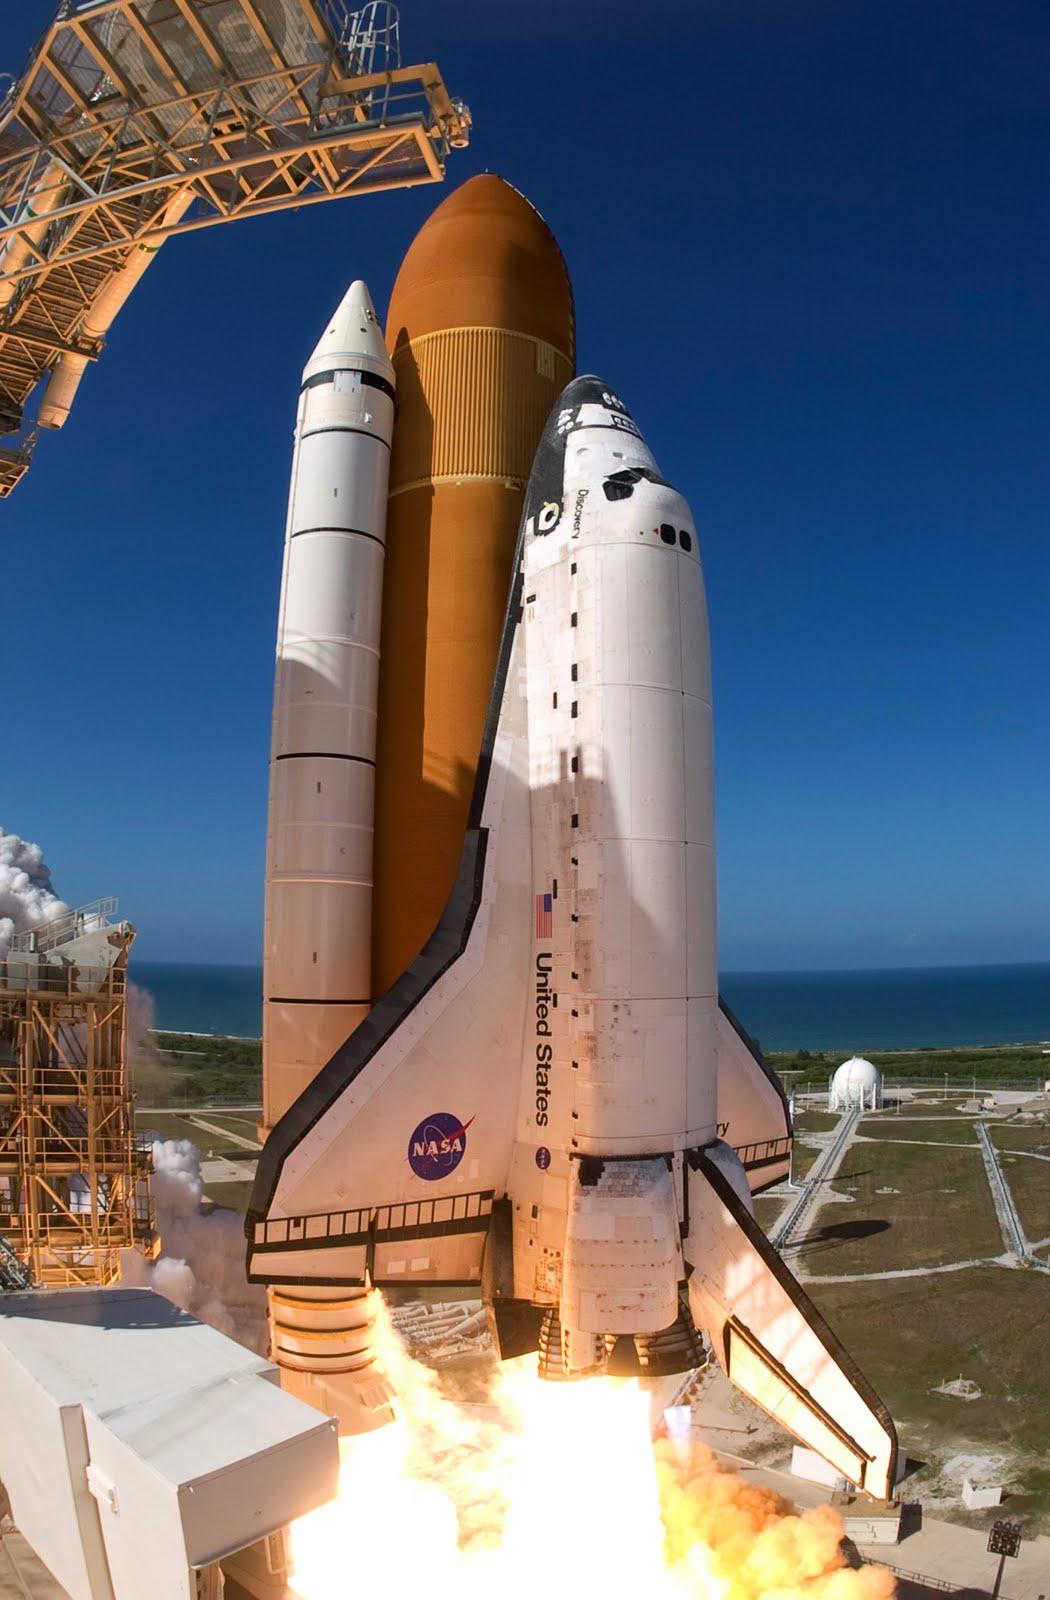 space shuttle fleet names - photo #22